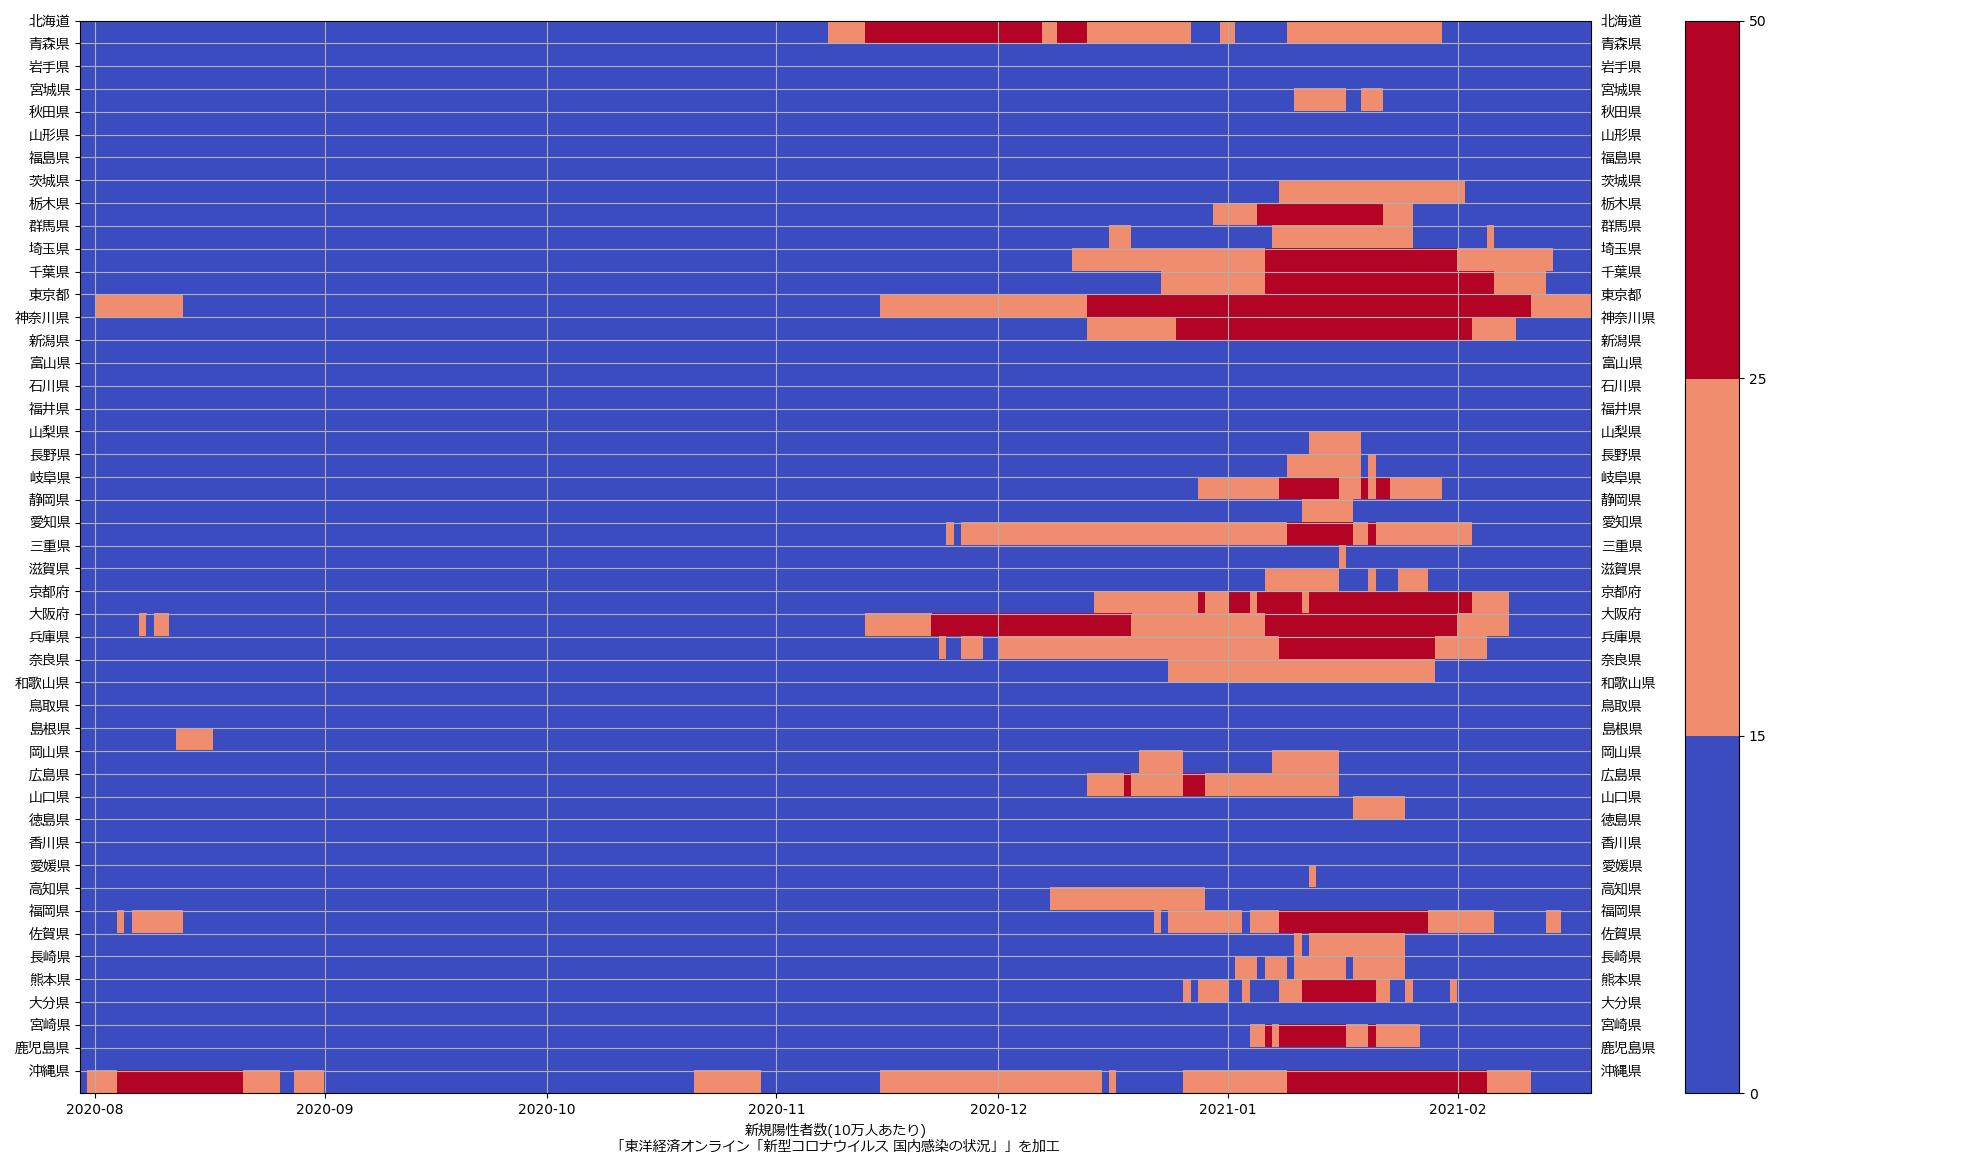 testedPositive_movavg_per100000_2021-02-19